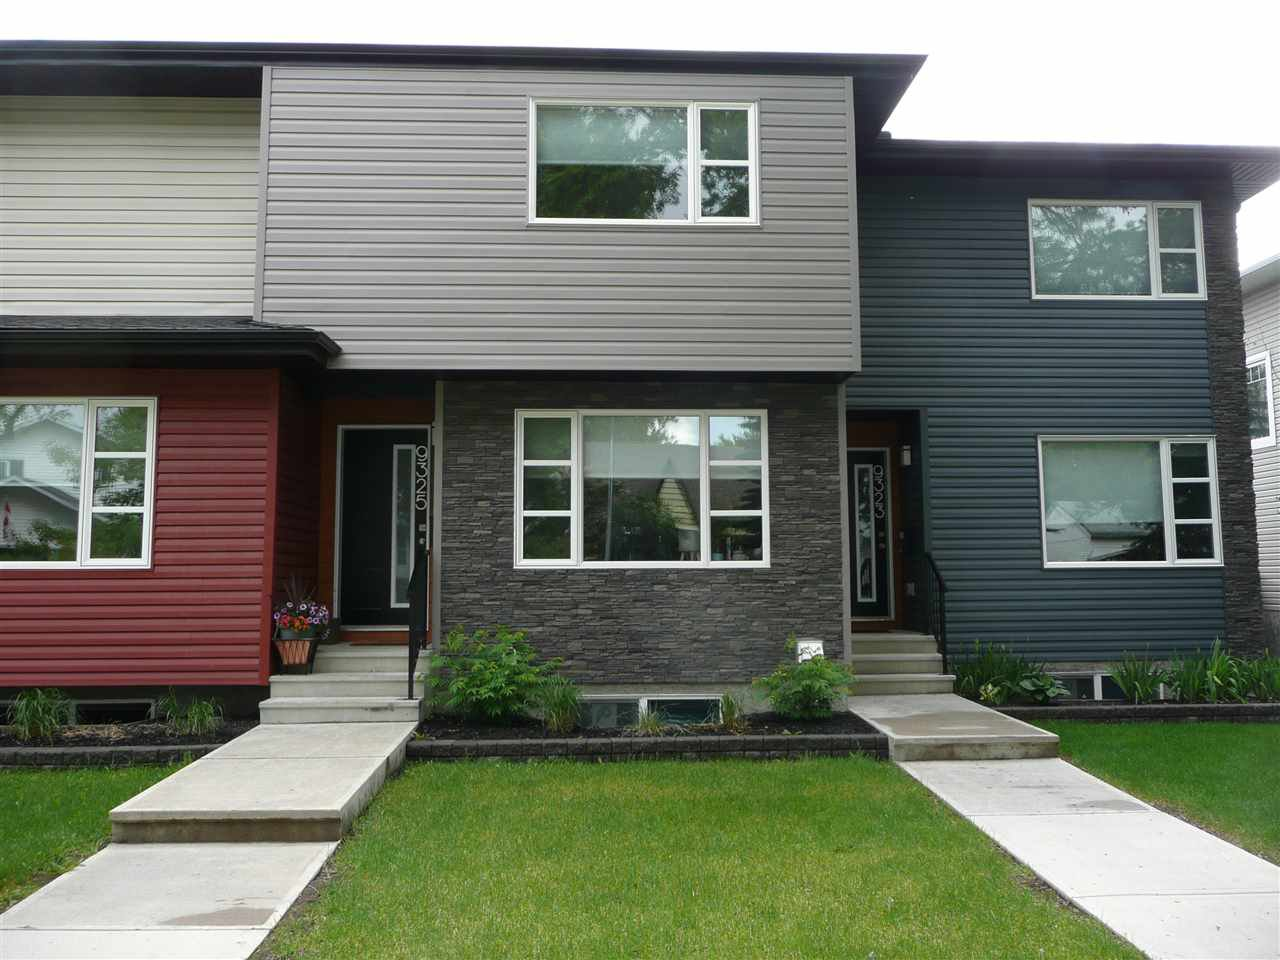 Main Photo: 9325 93 Street NW in Edmonton: Zone 18 House Triplex for sale : MLS®# E4202549